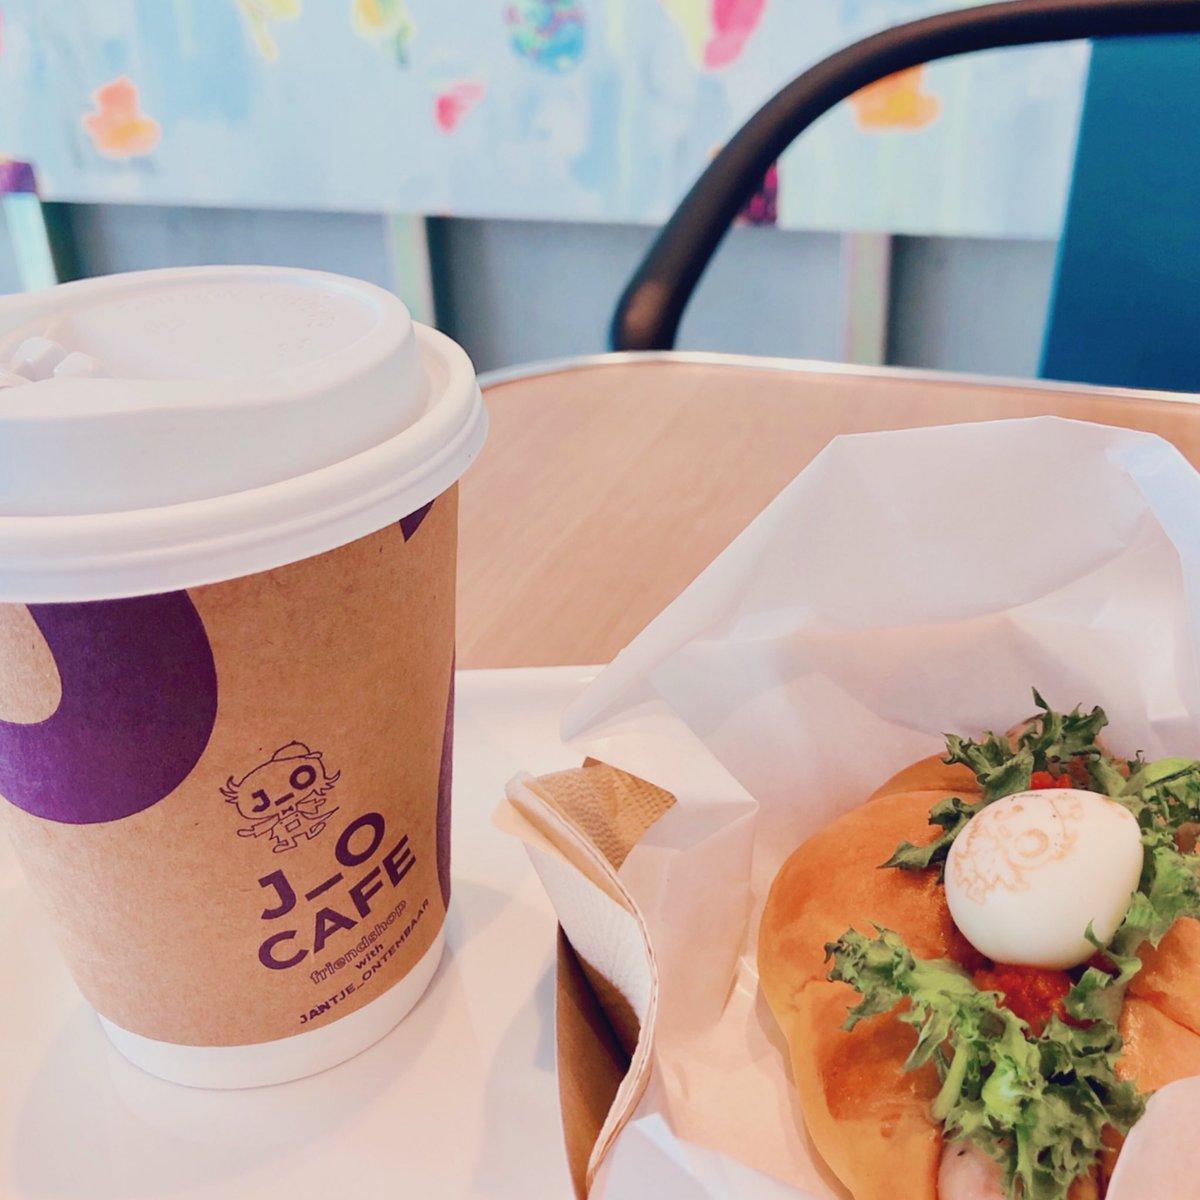 【J_O CAFE】草彅剛さん監修の第四弾《ホットブルドッグ#001》ハーブ香るソーセージにフレッシュトマトソース、J_Oくんアート付きうずらの卵をトッピング。フレッシュな美味しさをたいせつにする為、数量限定で販売しております。販売時間:11時13時15時17時#J_O_CAFE#BISTRO_J_O#ホットドッグ